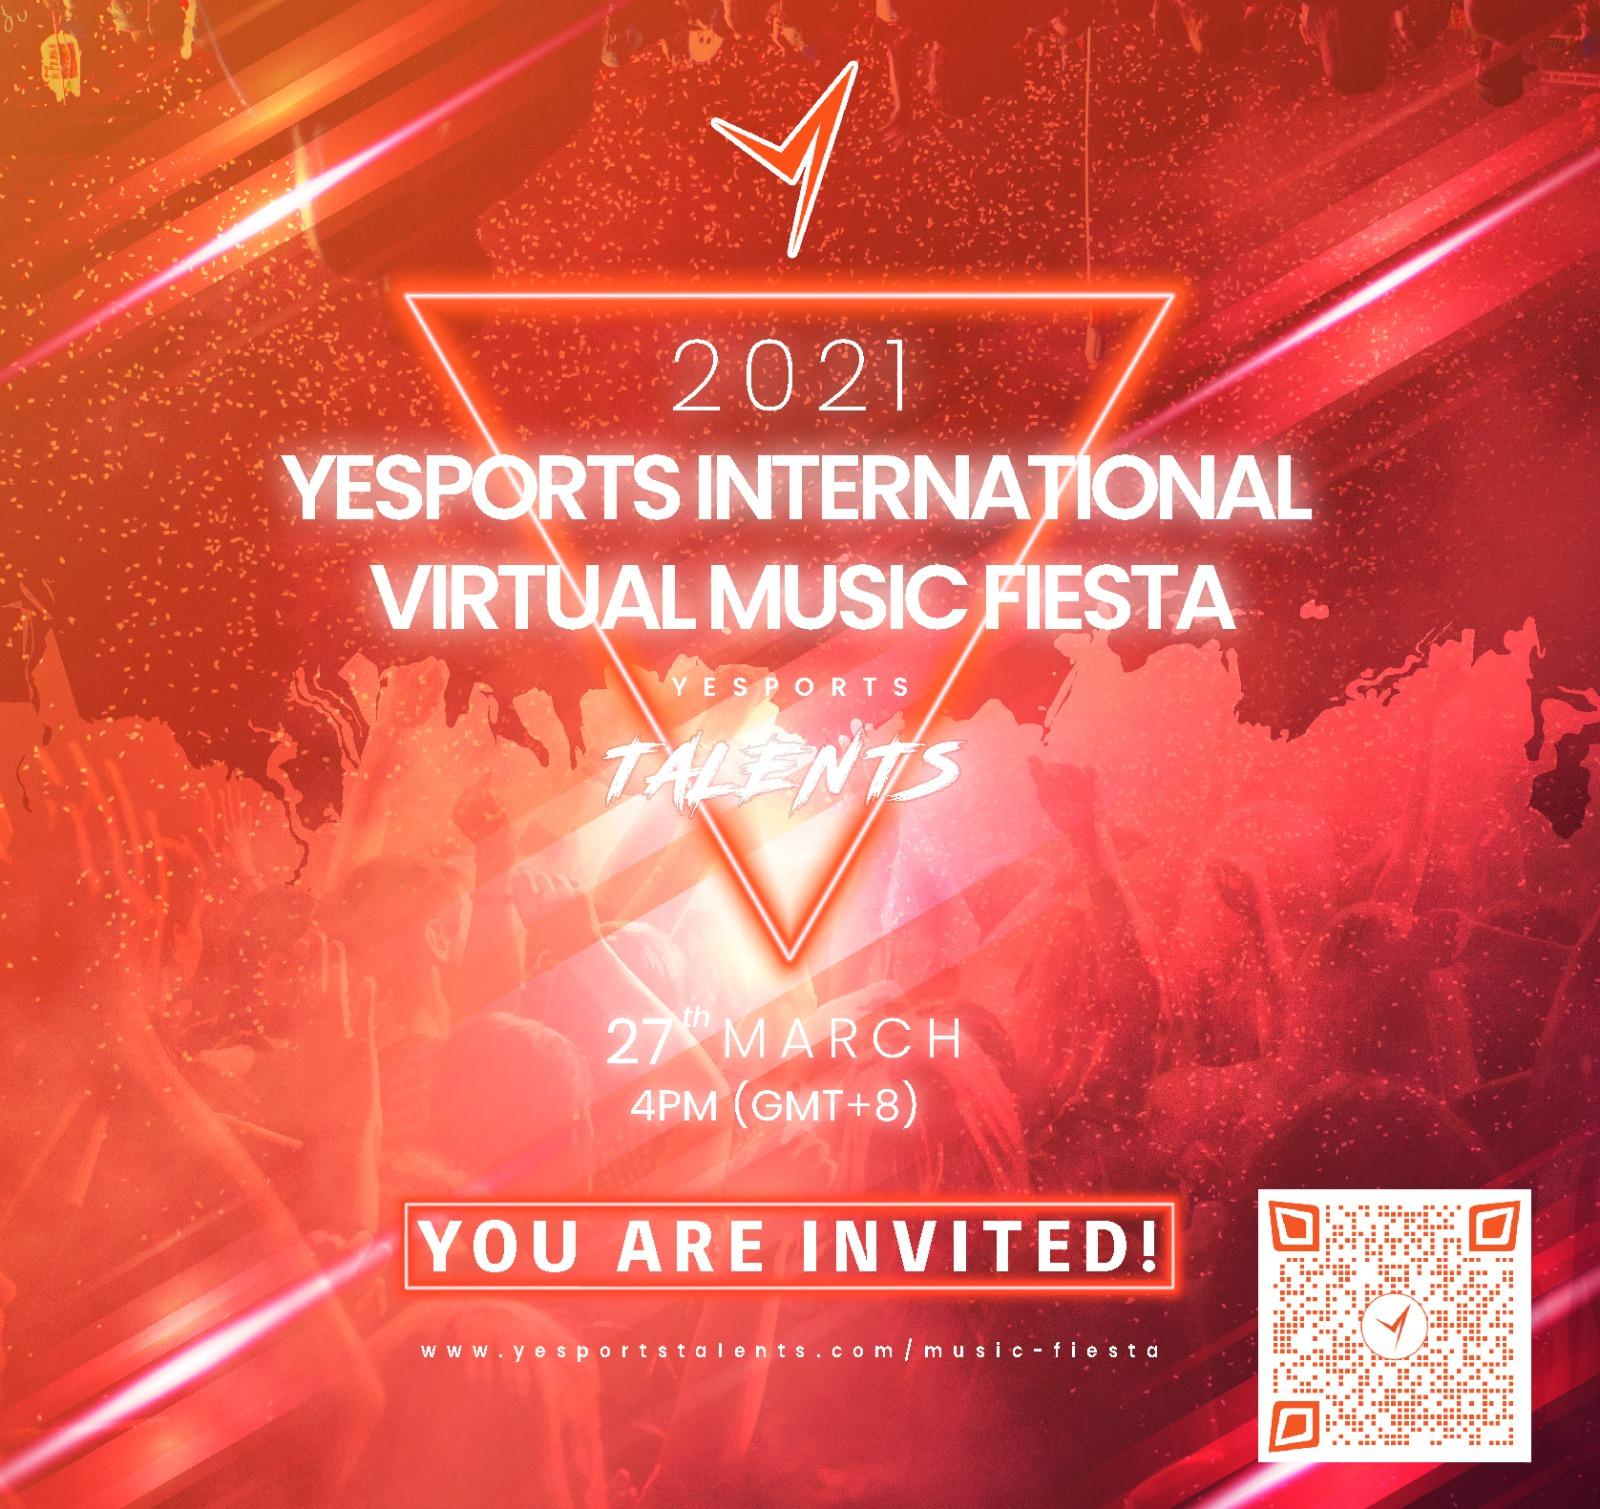 【International Virtual Music Fiesta with YESPORTS! 】